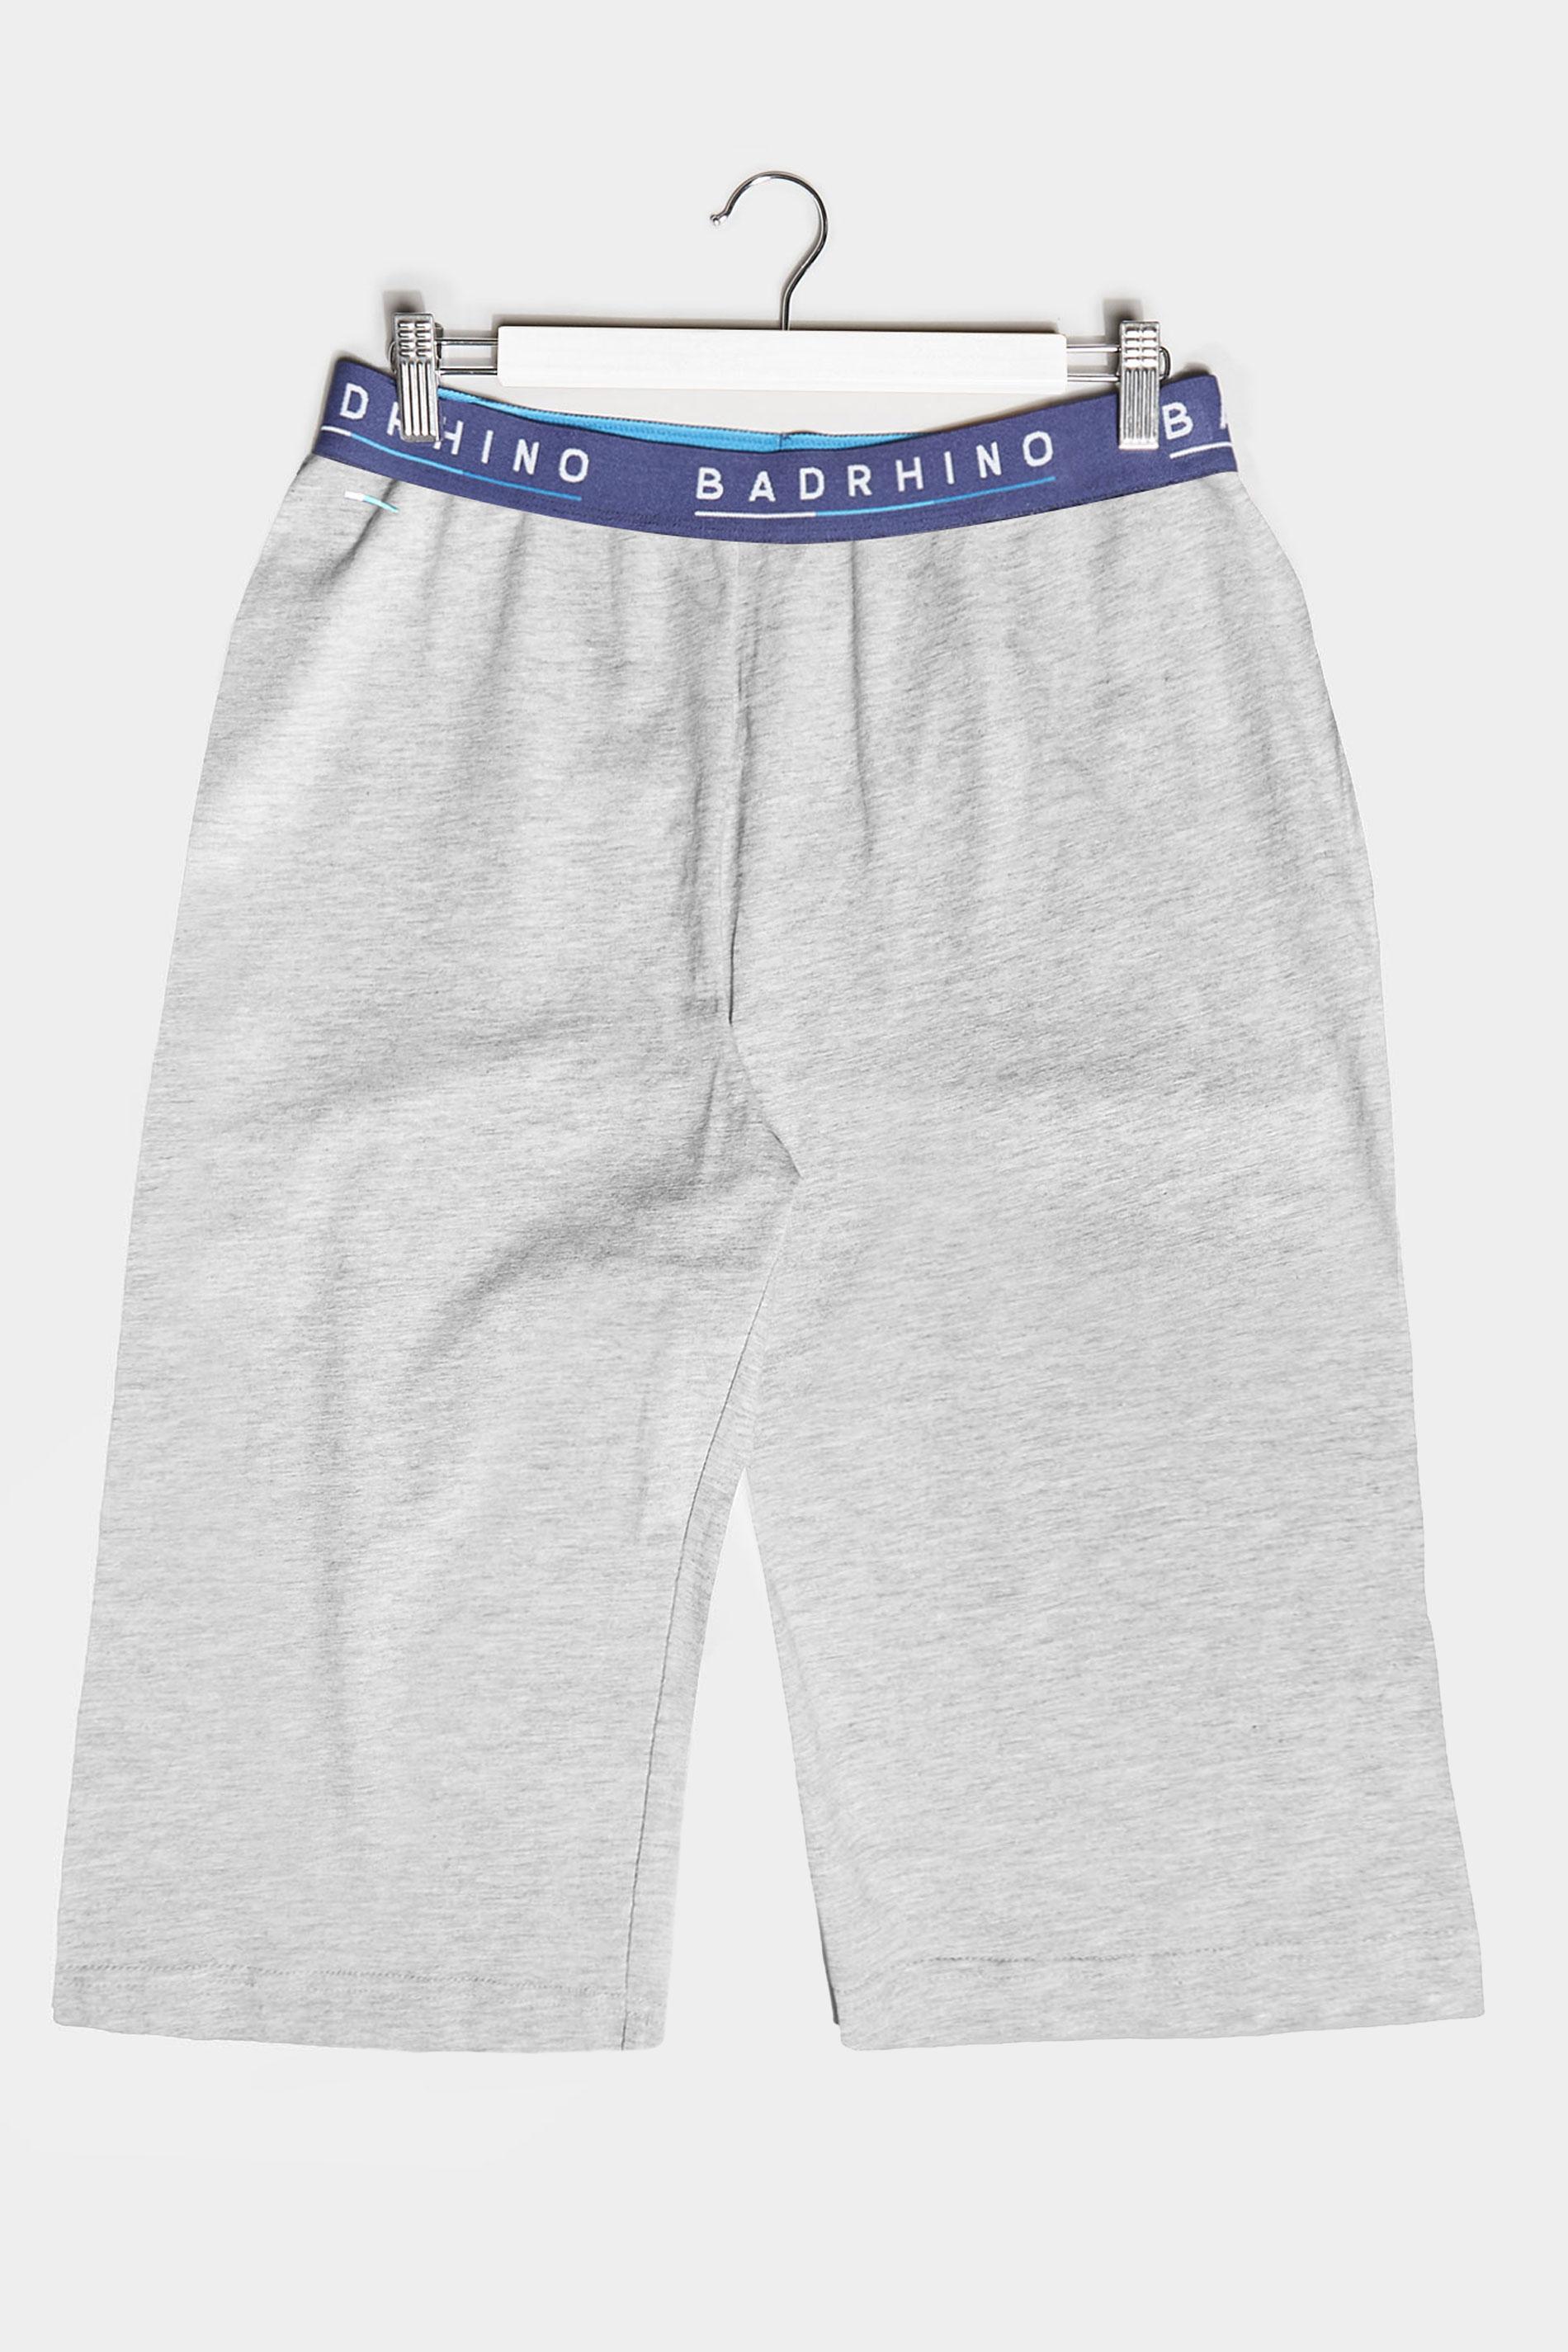 BadRhino Grey Marl Essential Lounge Shorts